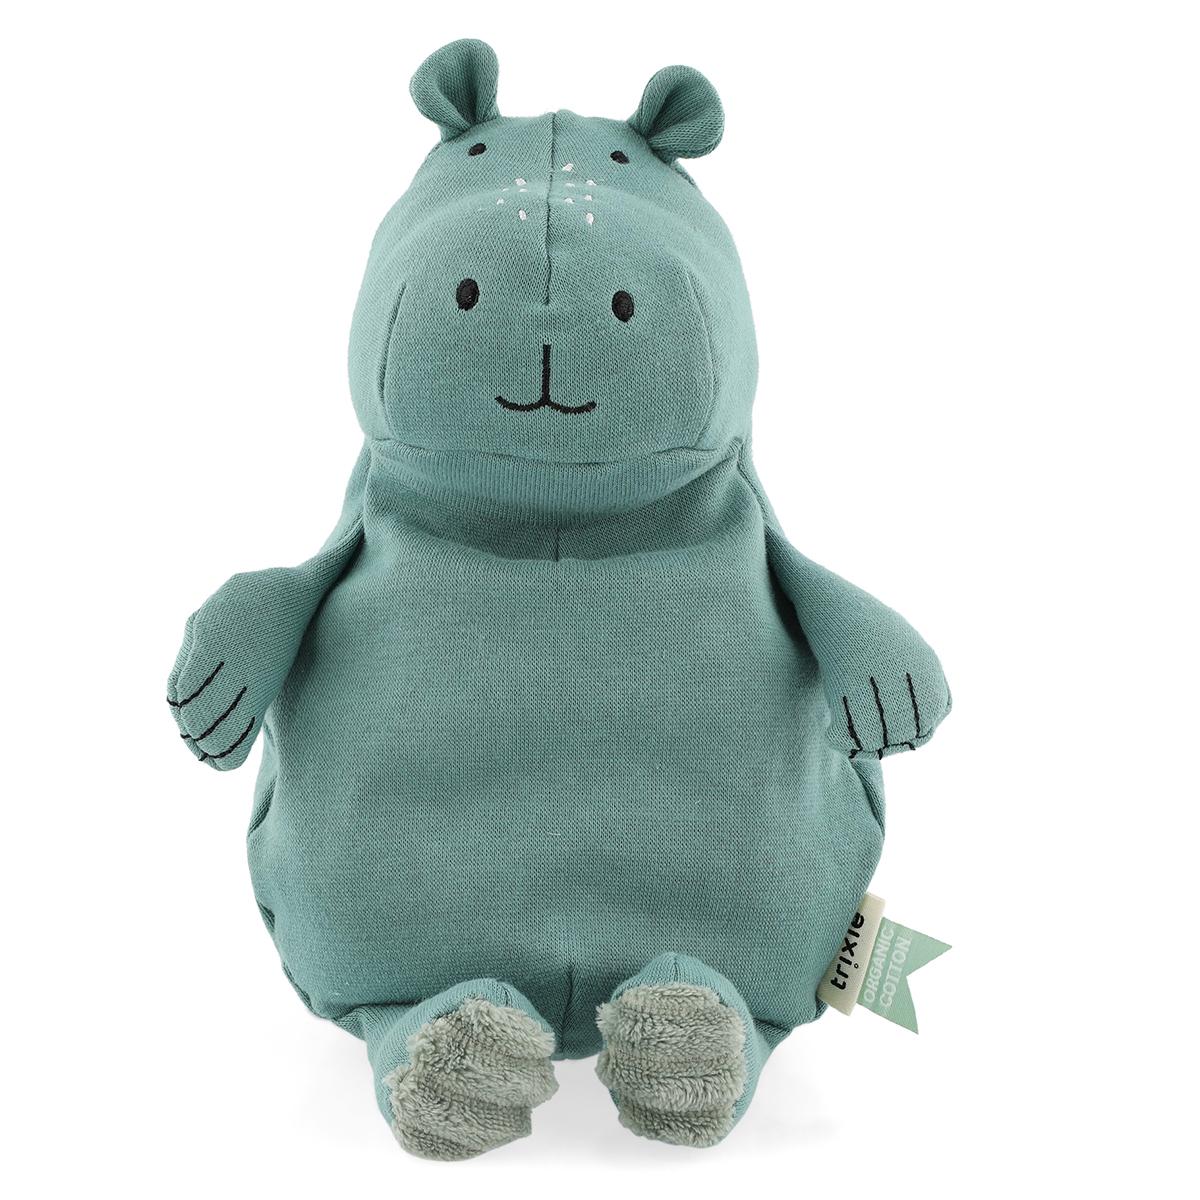 Peluche Petite Peluche Mr. Hippo Peluche Hippopotame 26 cm